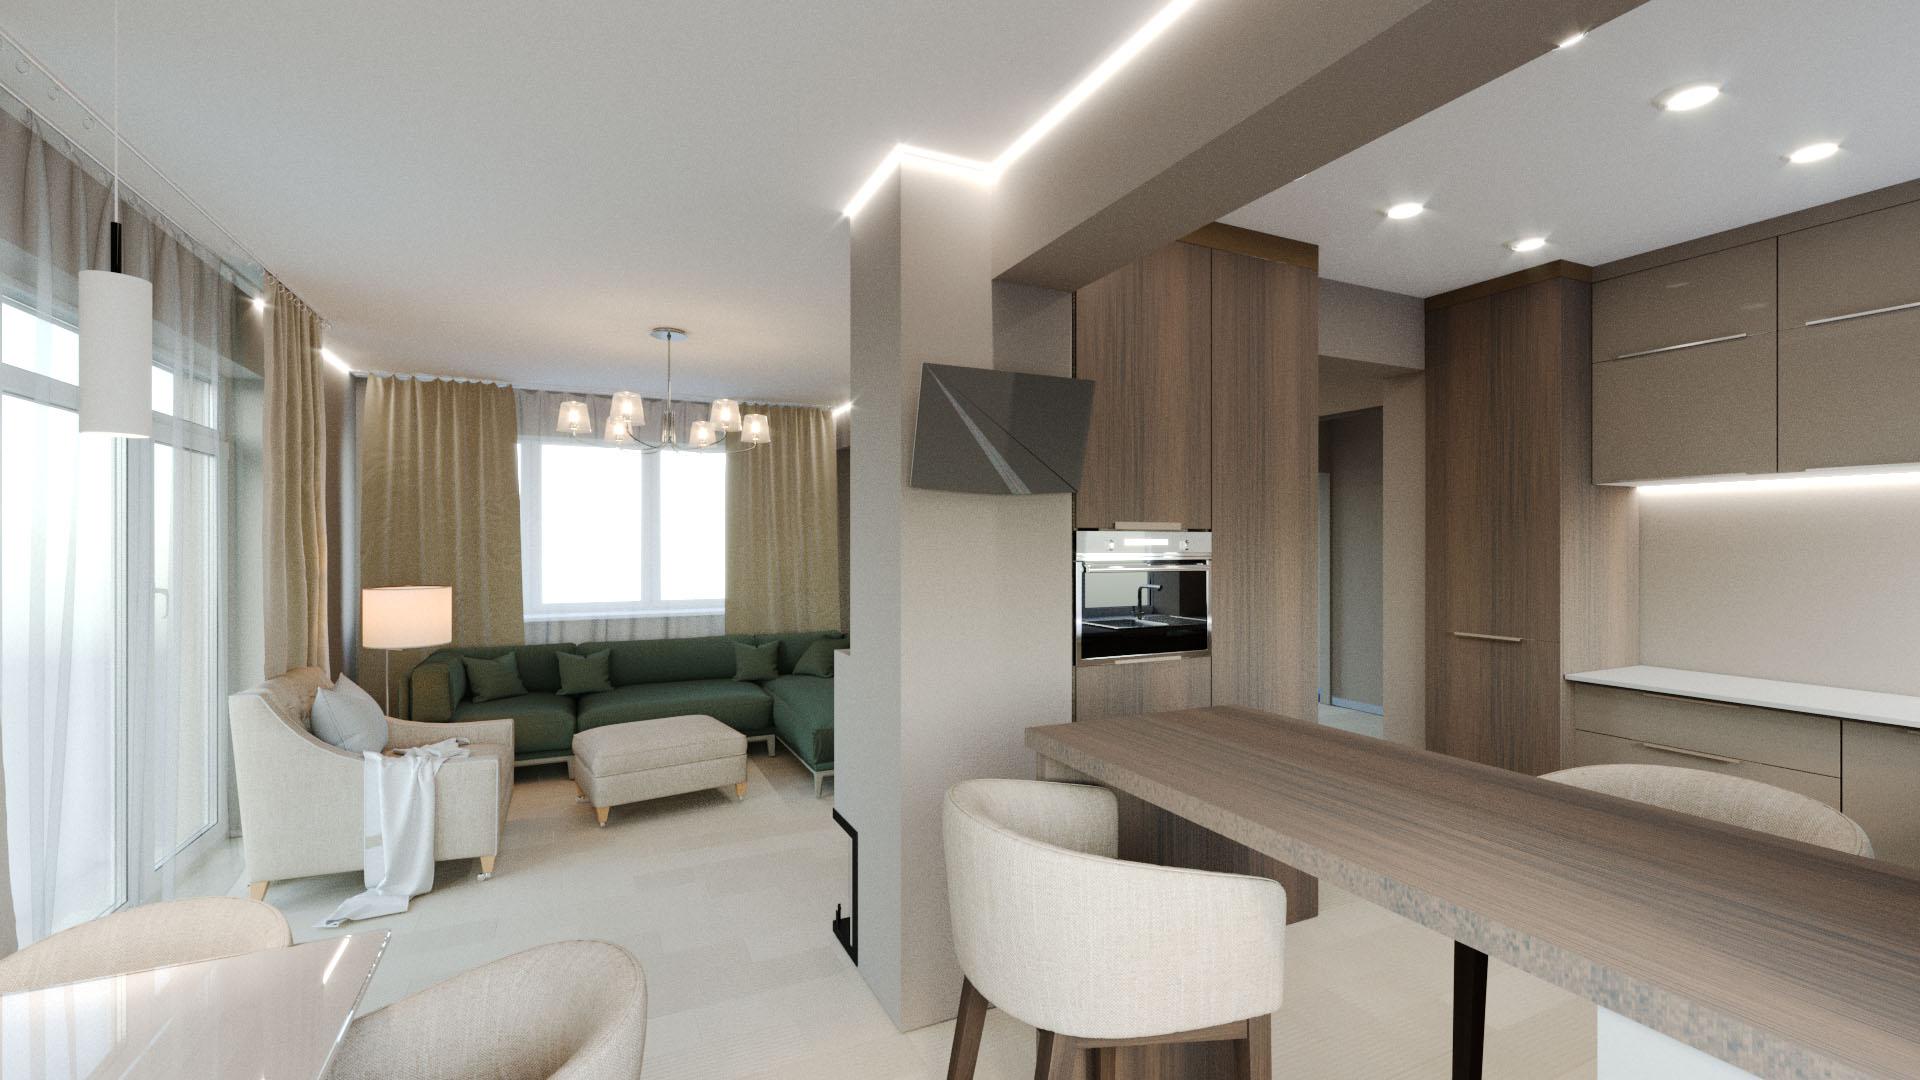 Фото Дизайн и визуализация гостиной и кухни частного дома